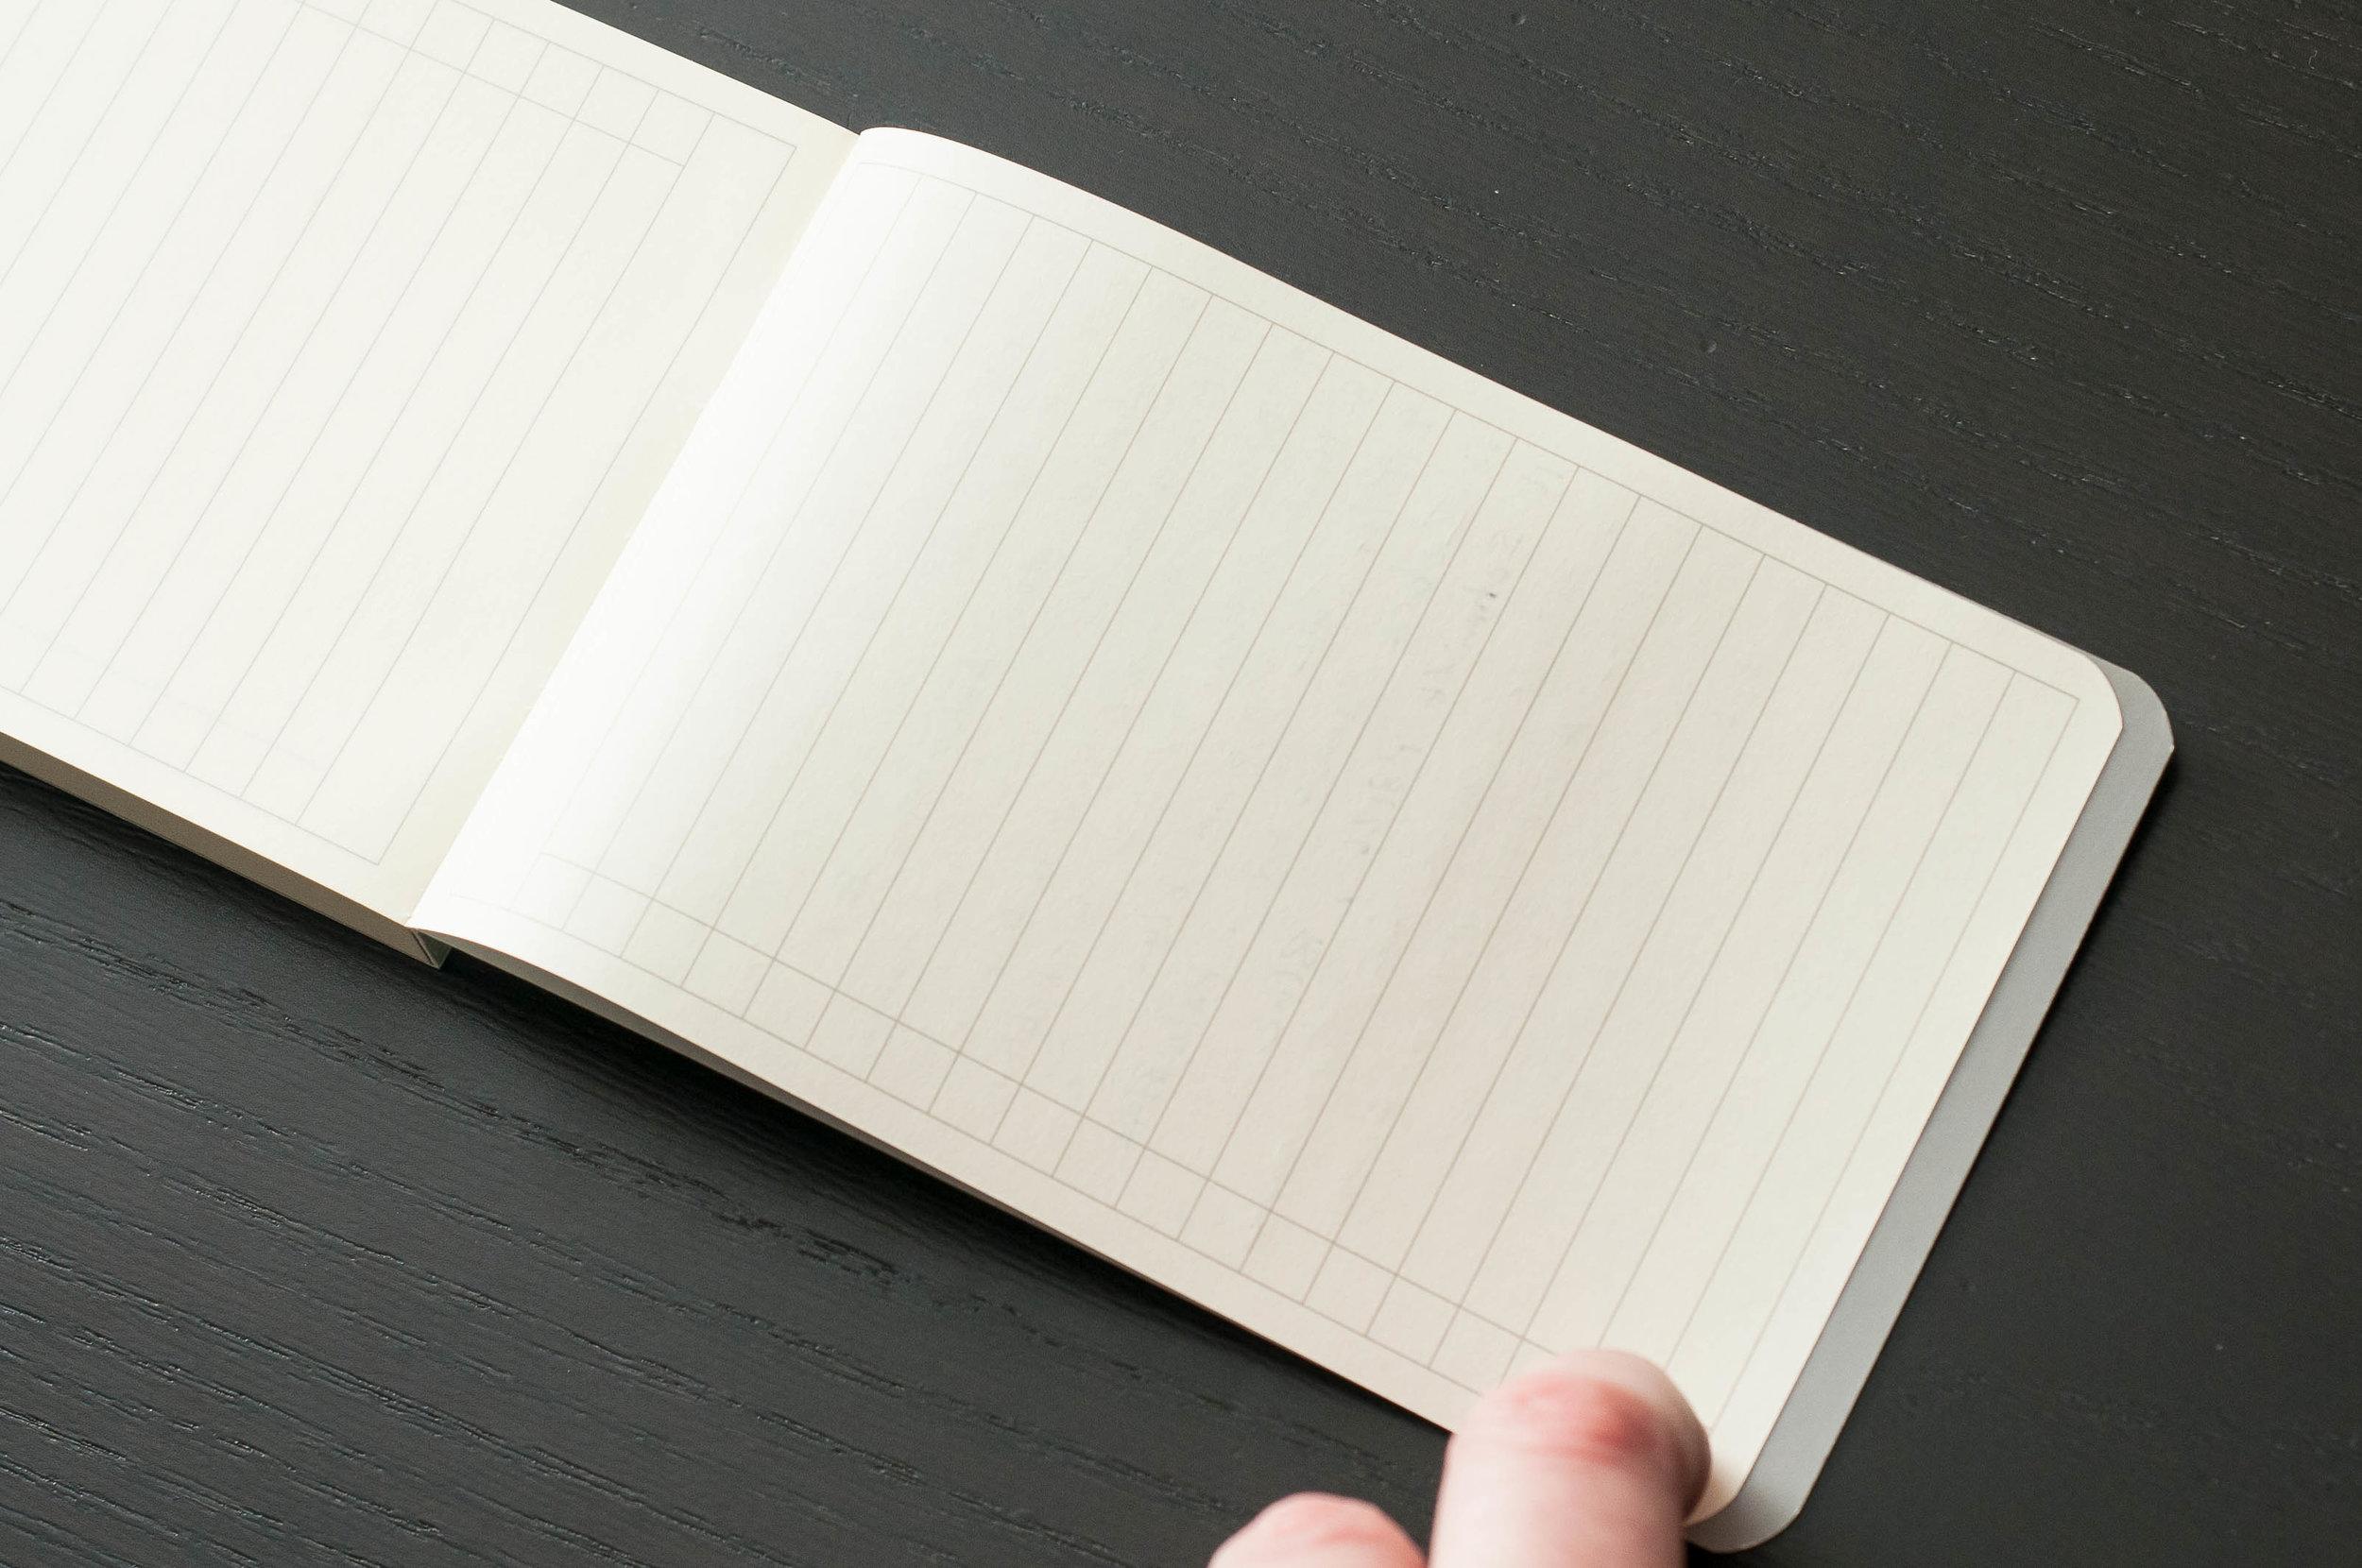 DesignWorks Note Pad Open